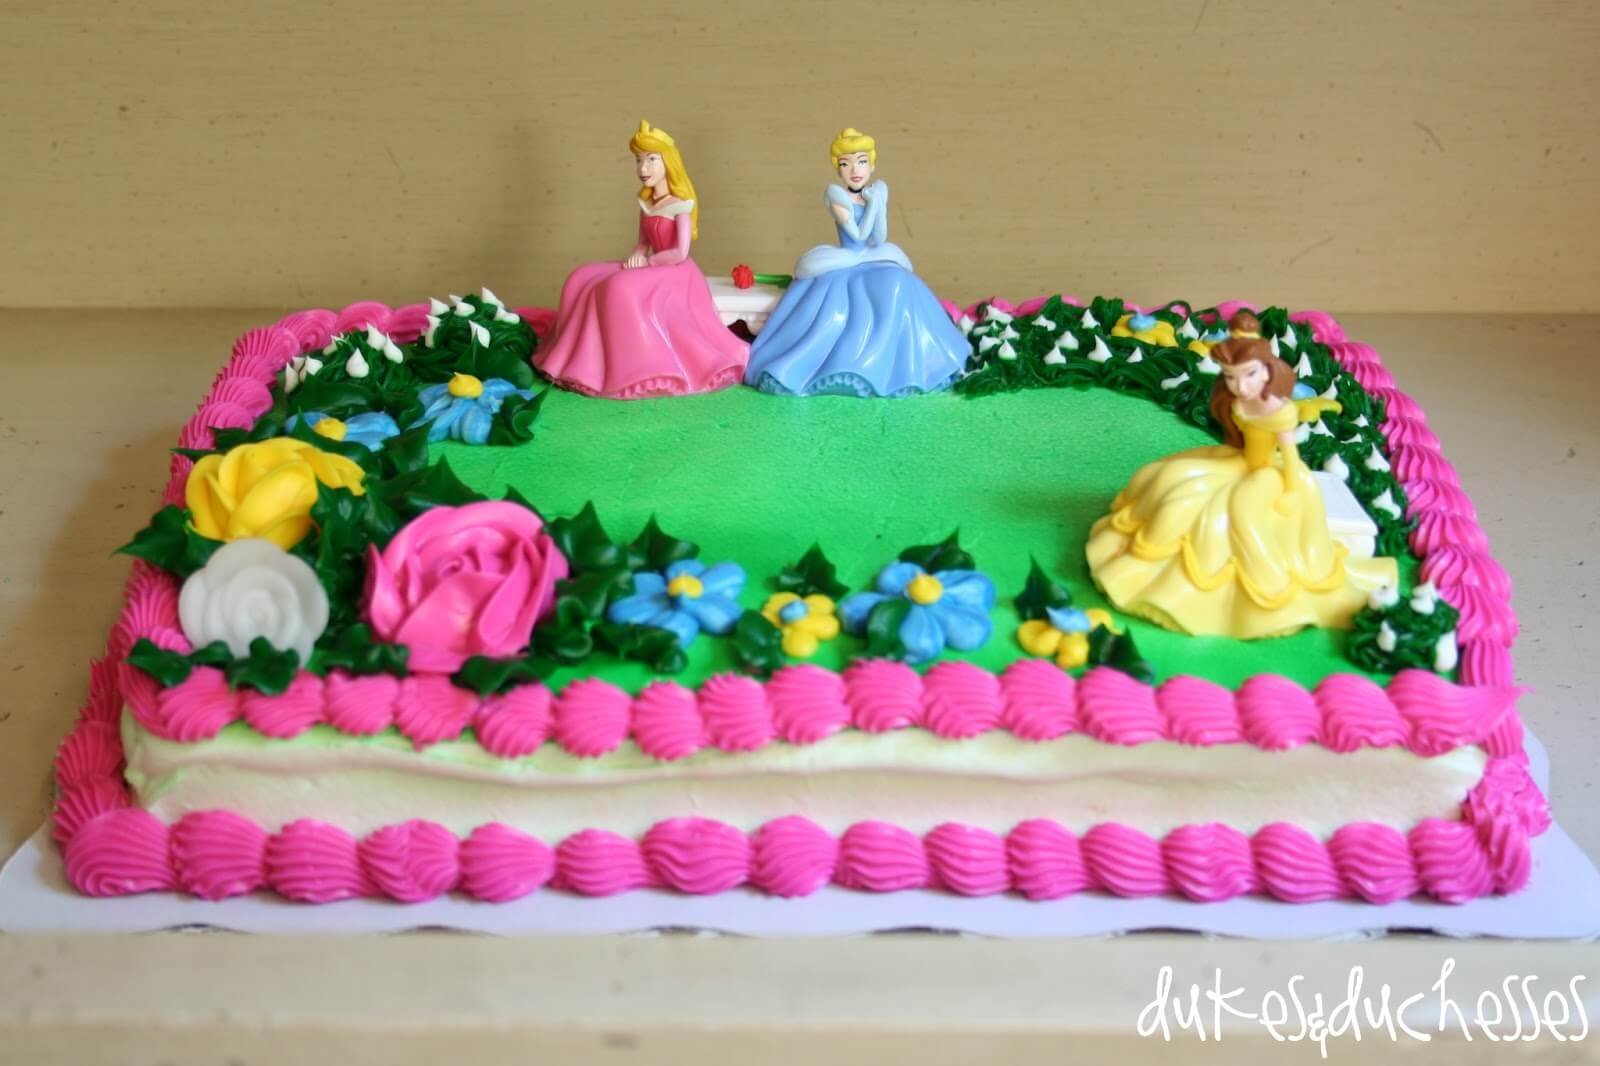 Terrific Craftylillybargainbin Blogspot Com Walmart Bakery Birthday Birthday Cards Printable Riciscafe Filternl